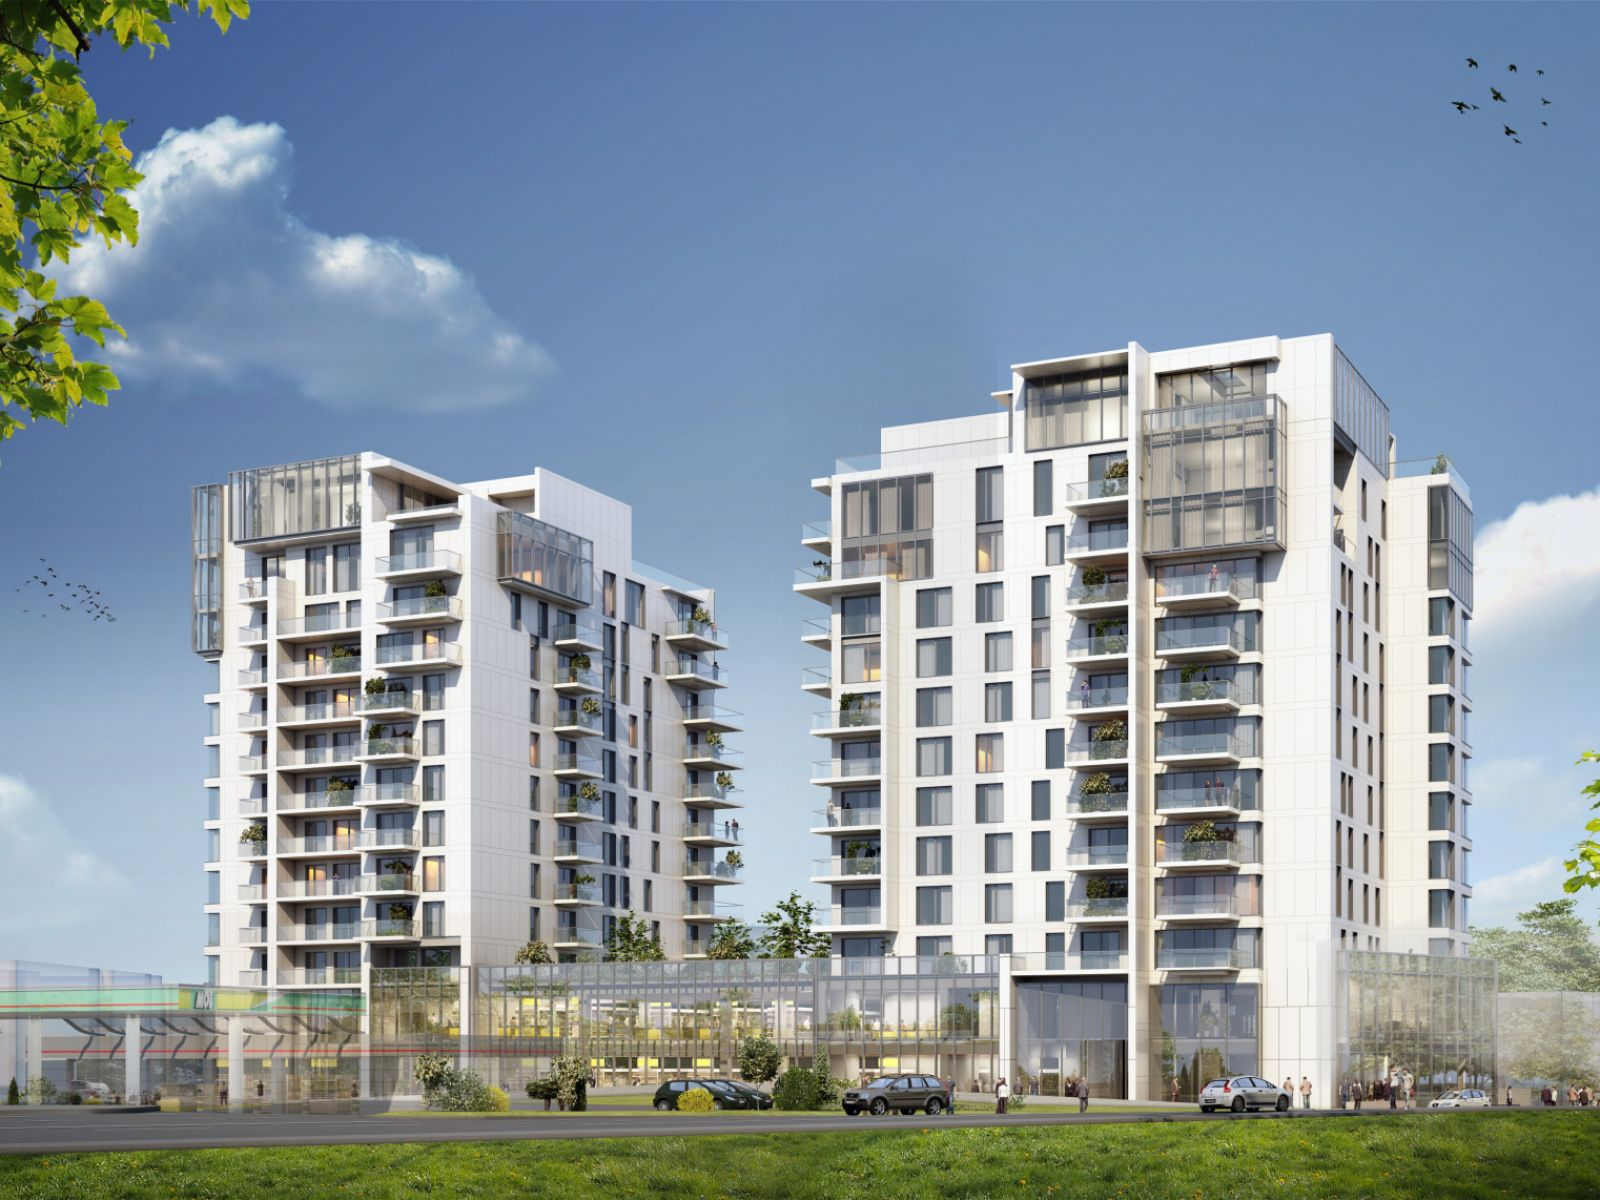 One Herăstrău Towers featured on CaseBune.ro